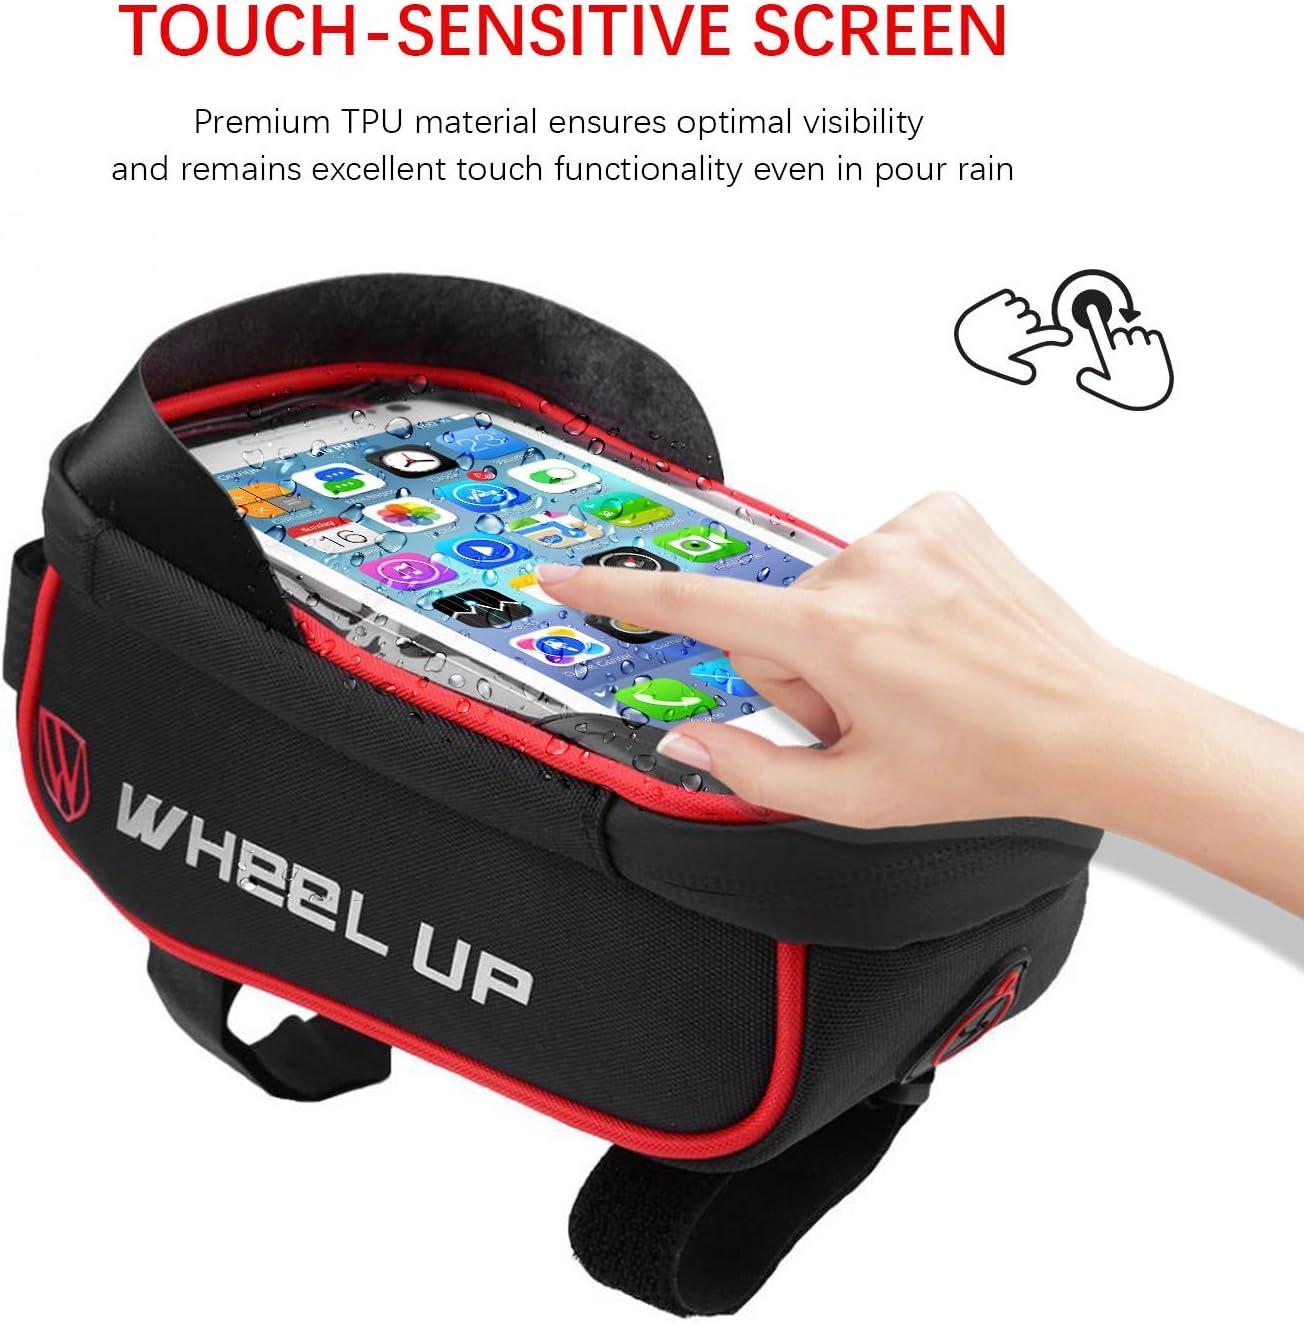 Universal Waterproof Phone Case Bicycle Bag with Waterproof Touch Screen with Sun Visor for Phone Tricodale Bike Handlebar Bag